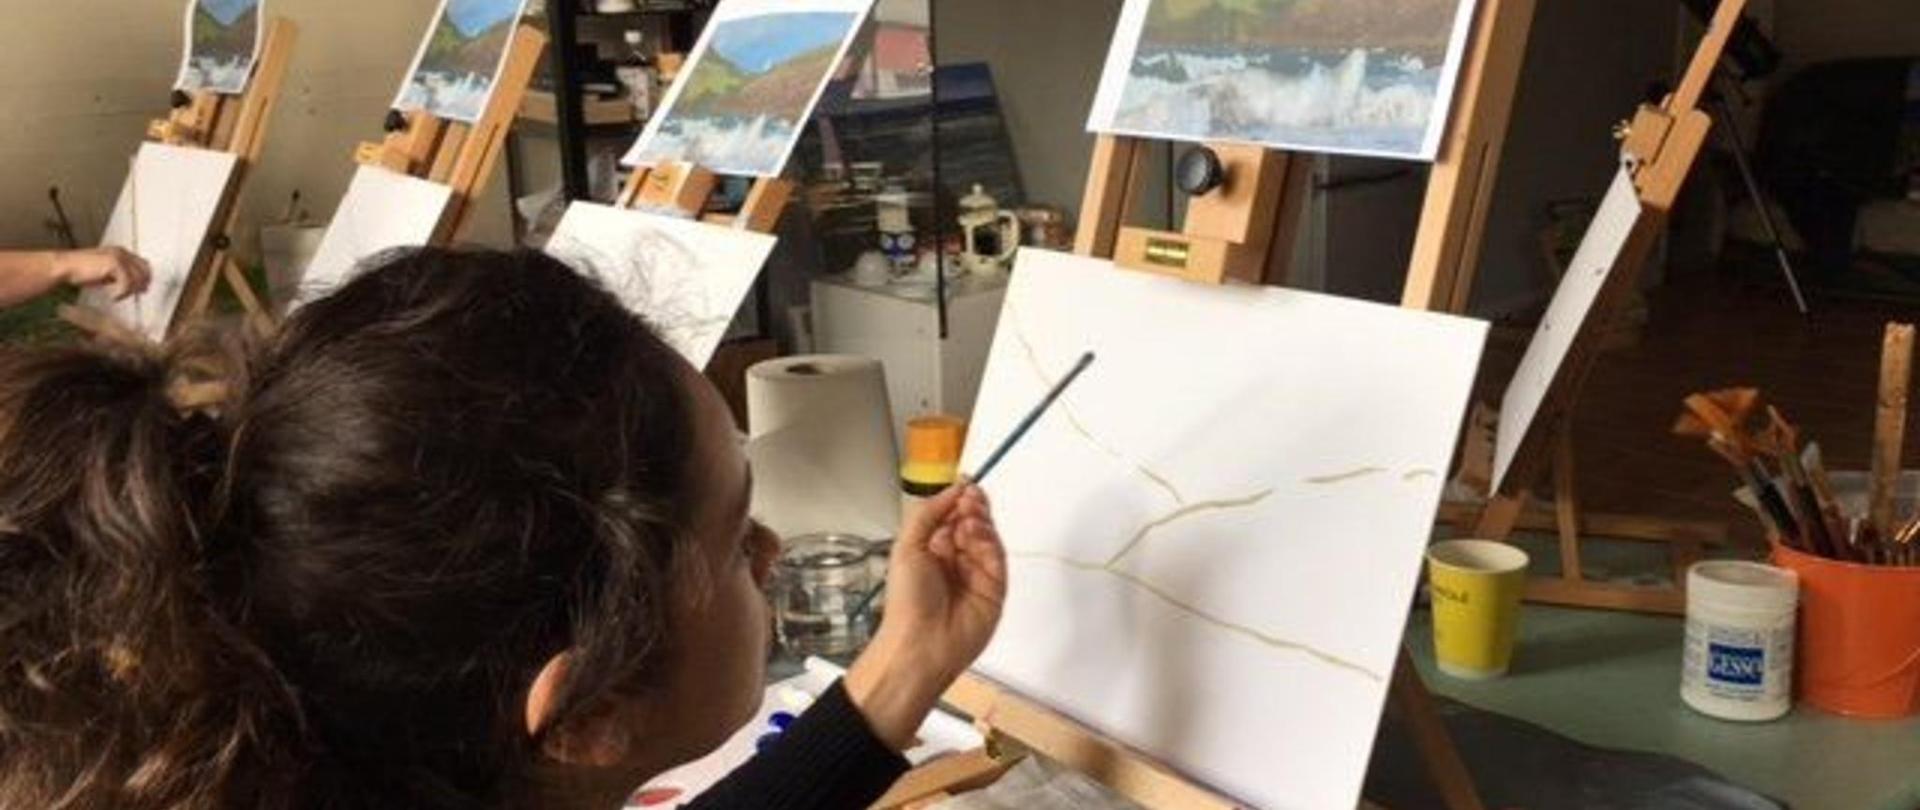 theresa-painting.JPG